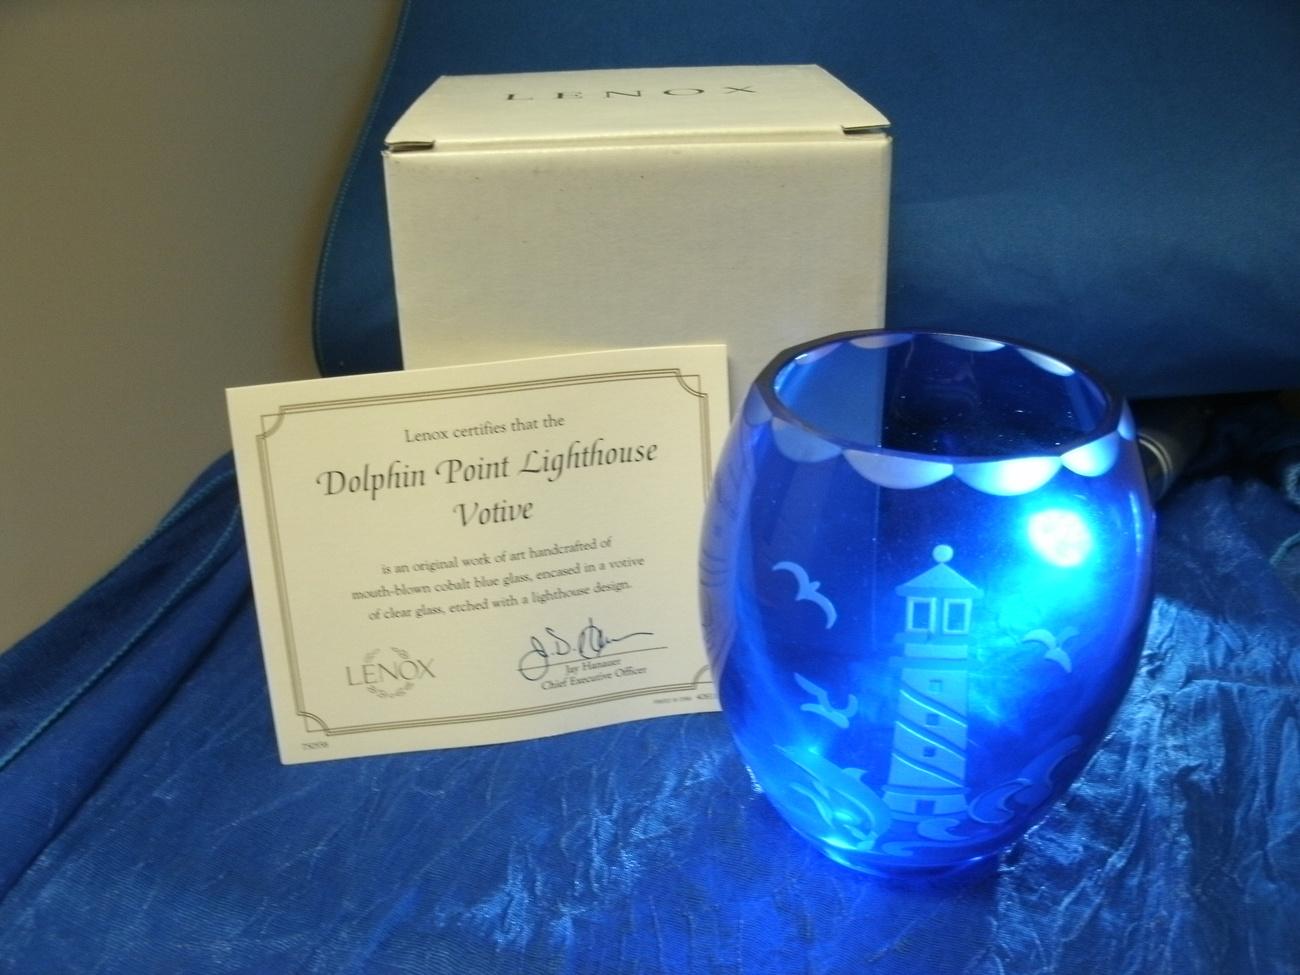 Cobalt Blue Glass Dolphin Point Lighthouse Votive by LENOX - Mint in Original Bo image 2